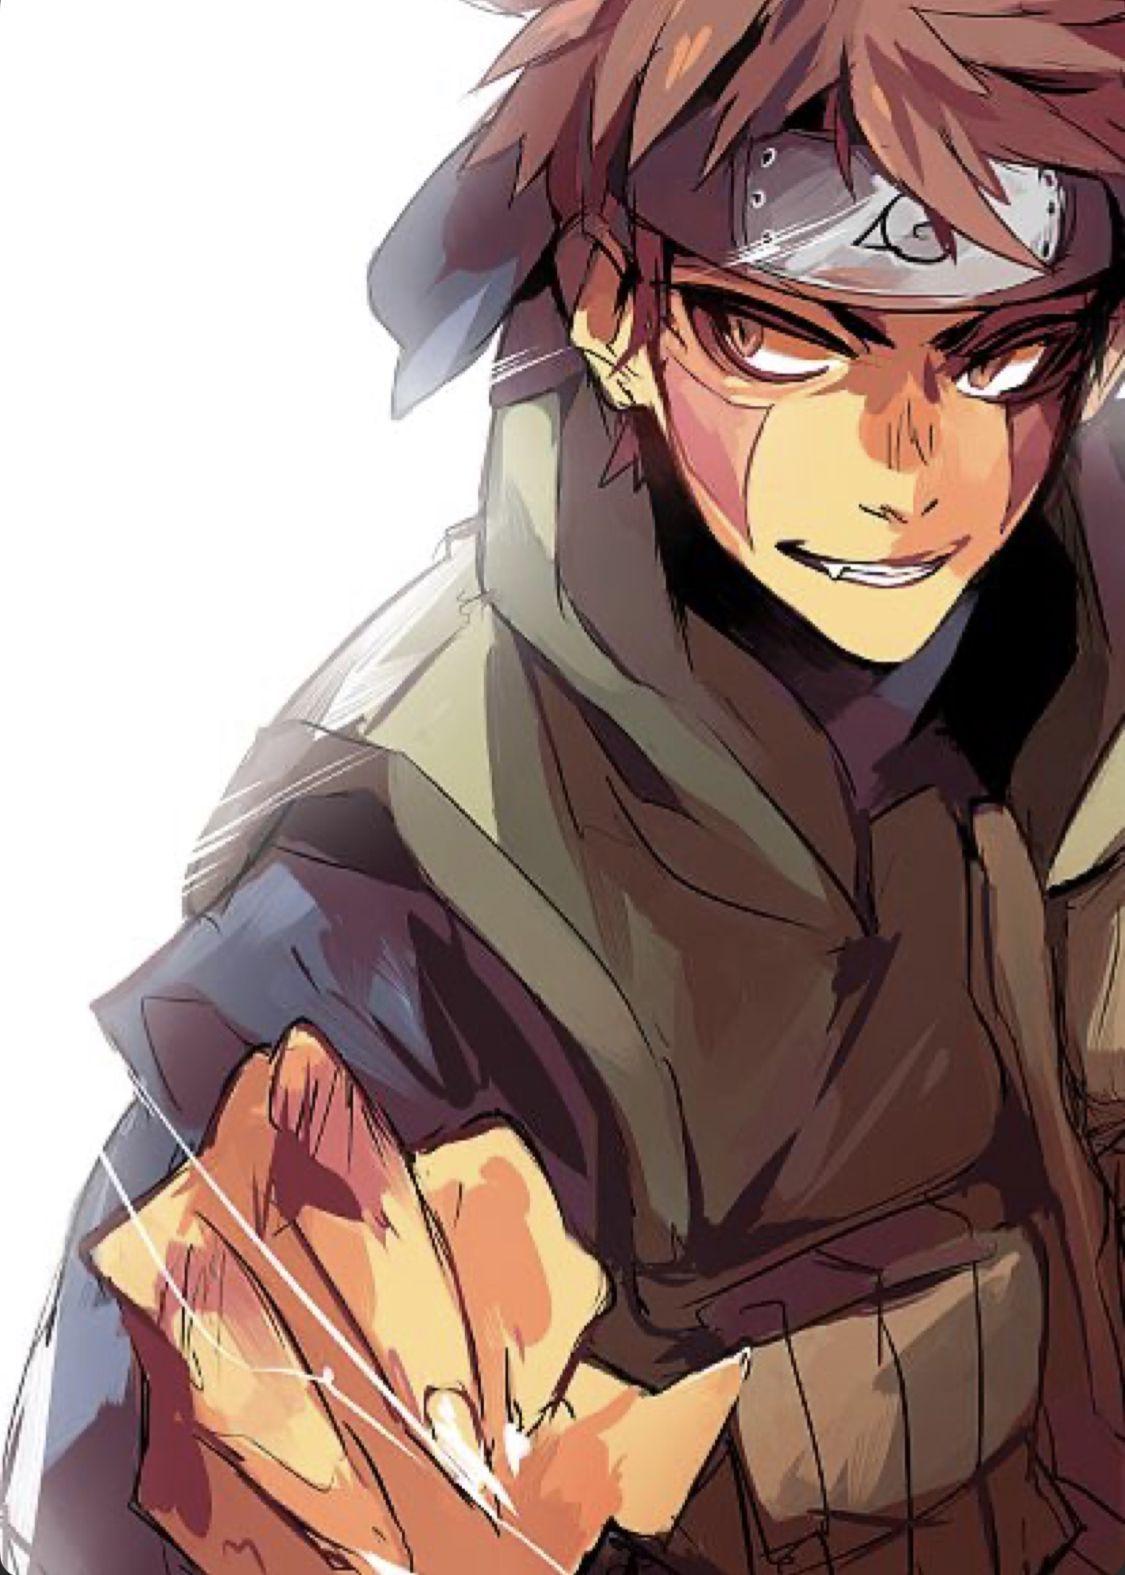 Recueil d'os anime/manga fanfiction Fanfiction